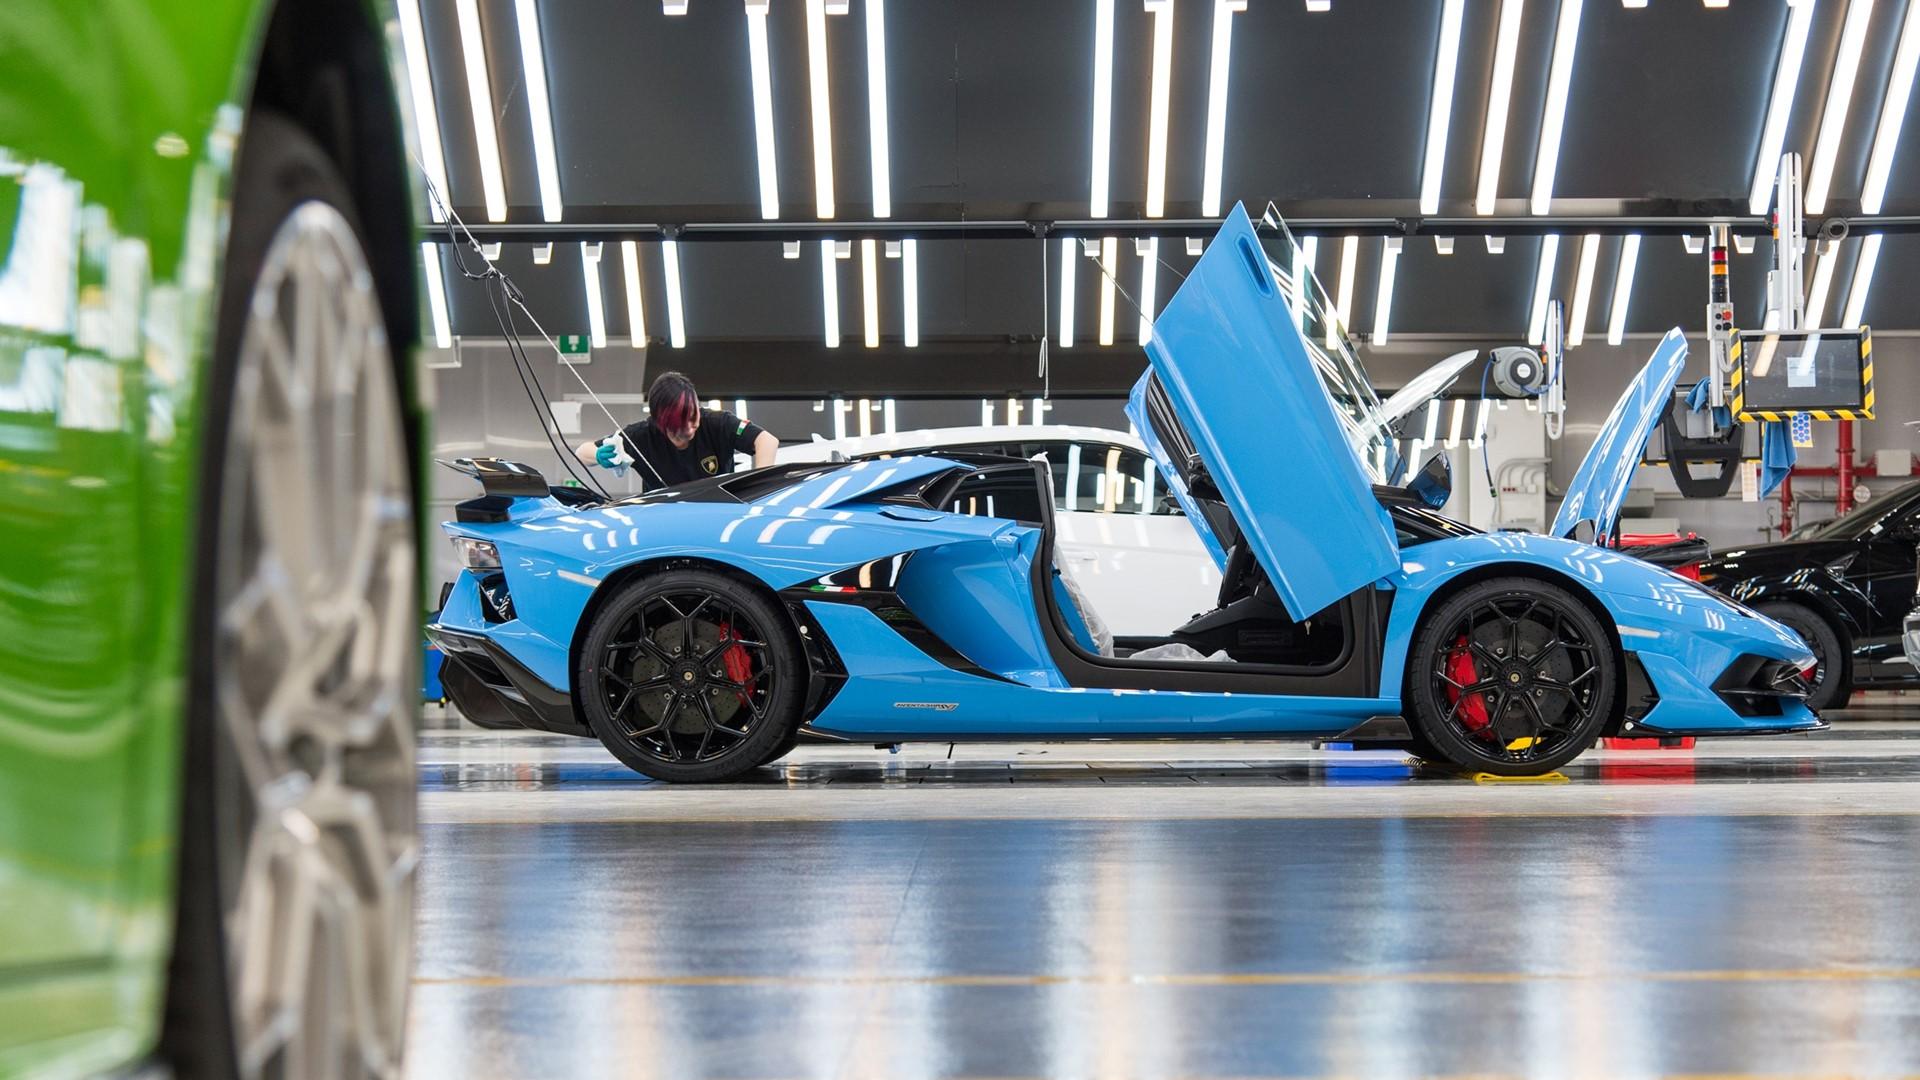 Lamborghini Christmas Drive: a holiday journey with Aventador SVJ, Huracán EVO and Urus celebrates a successful 2019 - Image 5